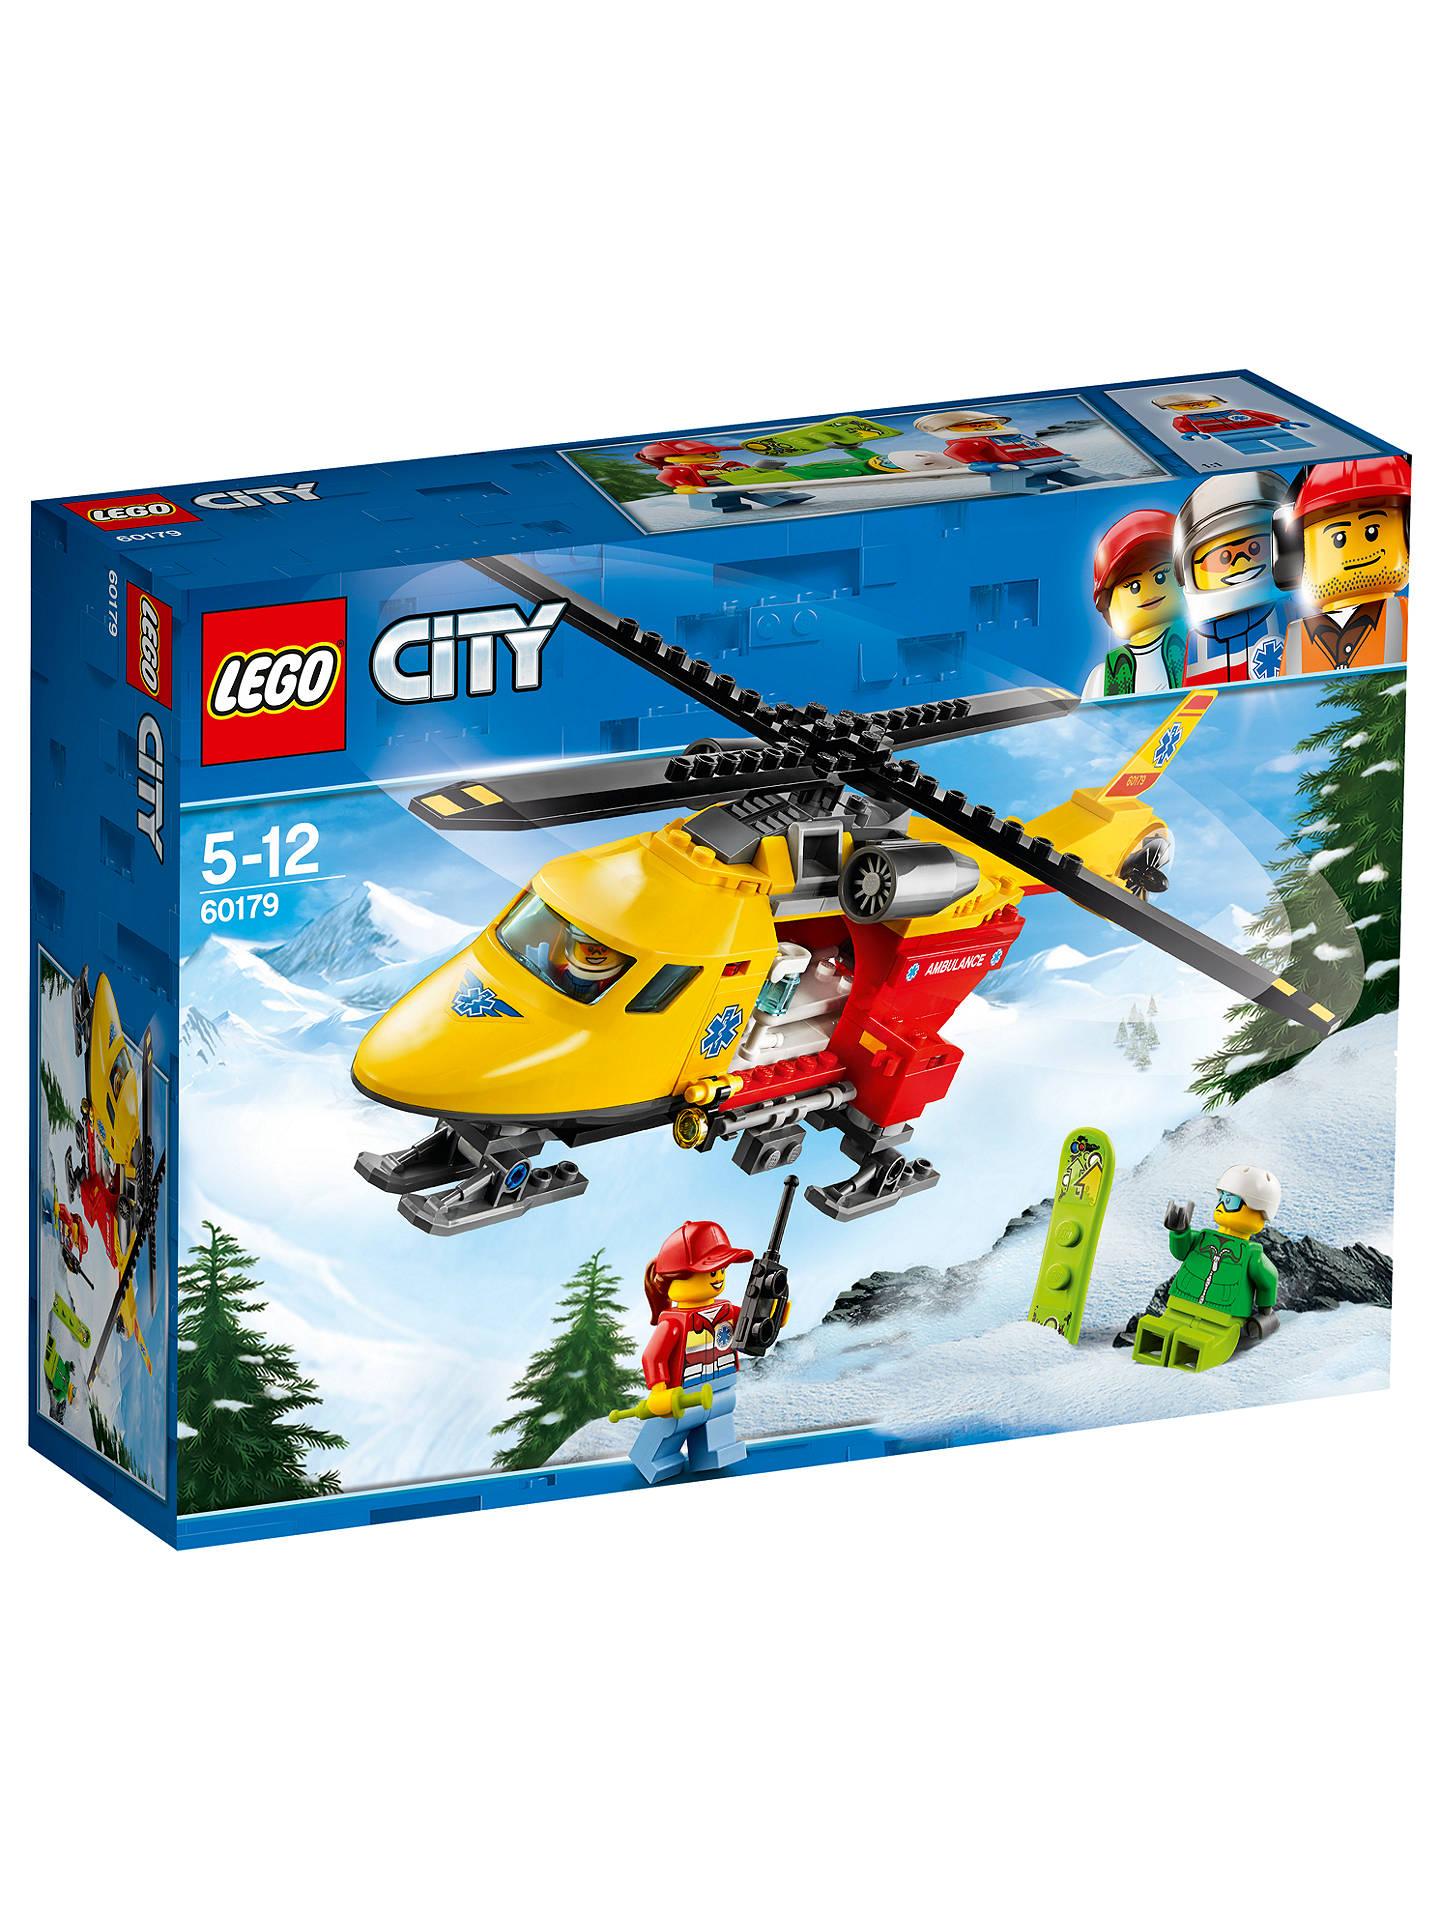 lego city 60179 ambulance helicopter at john lewis partners. Black Bedroom Furniture Sets. Home Design Ideas